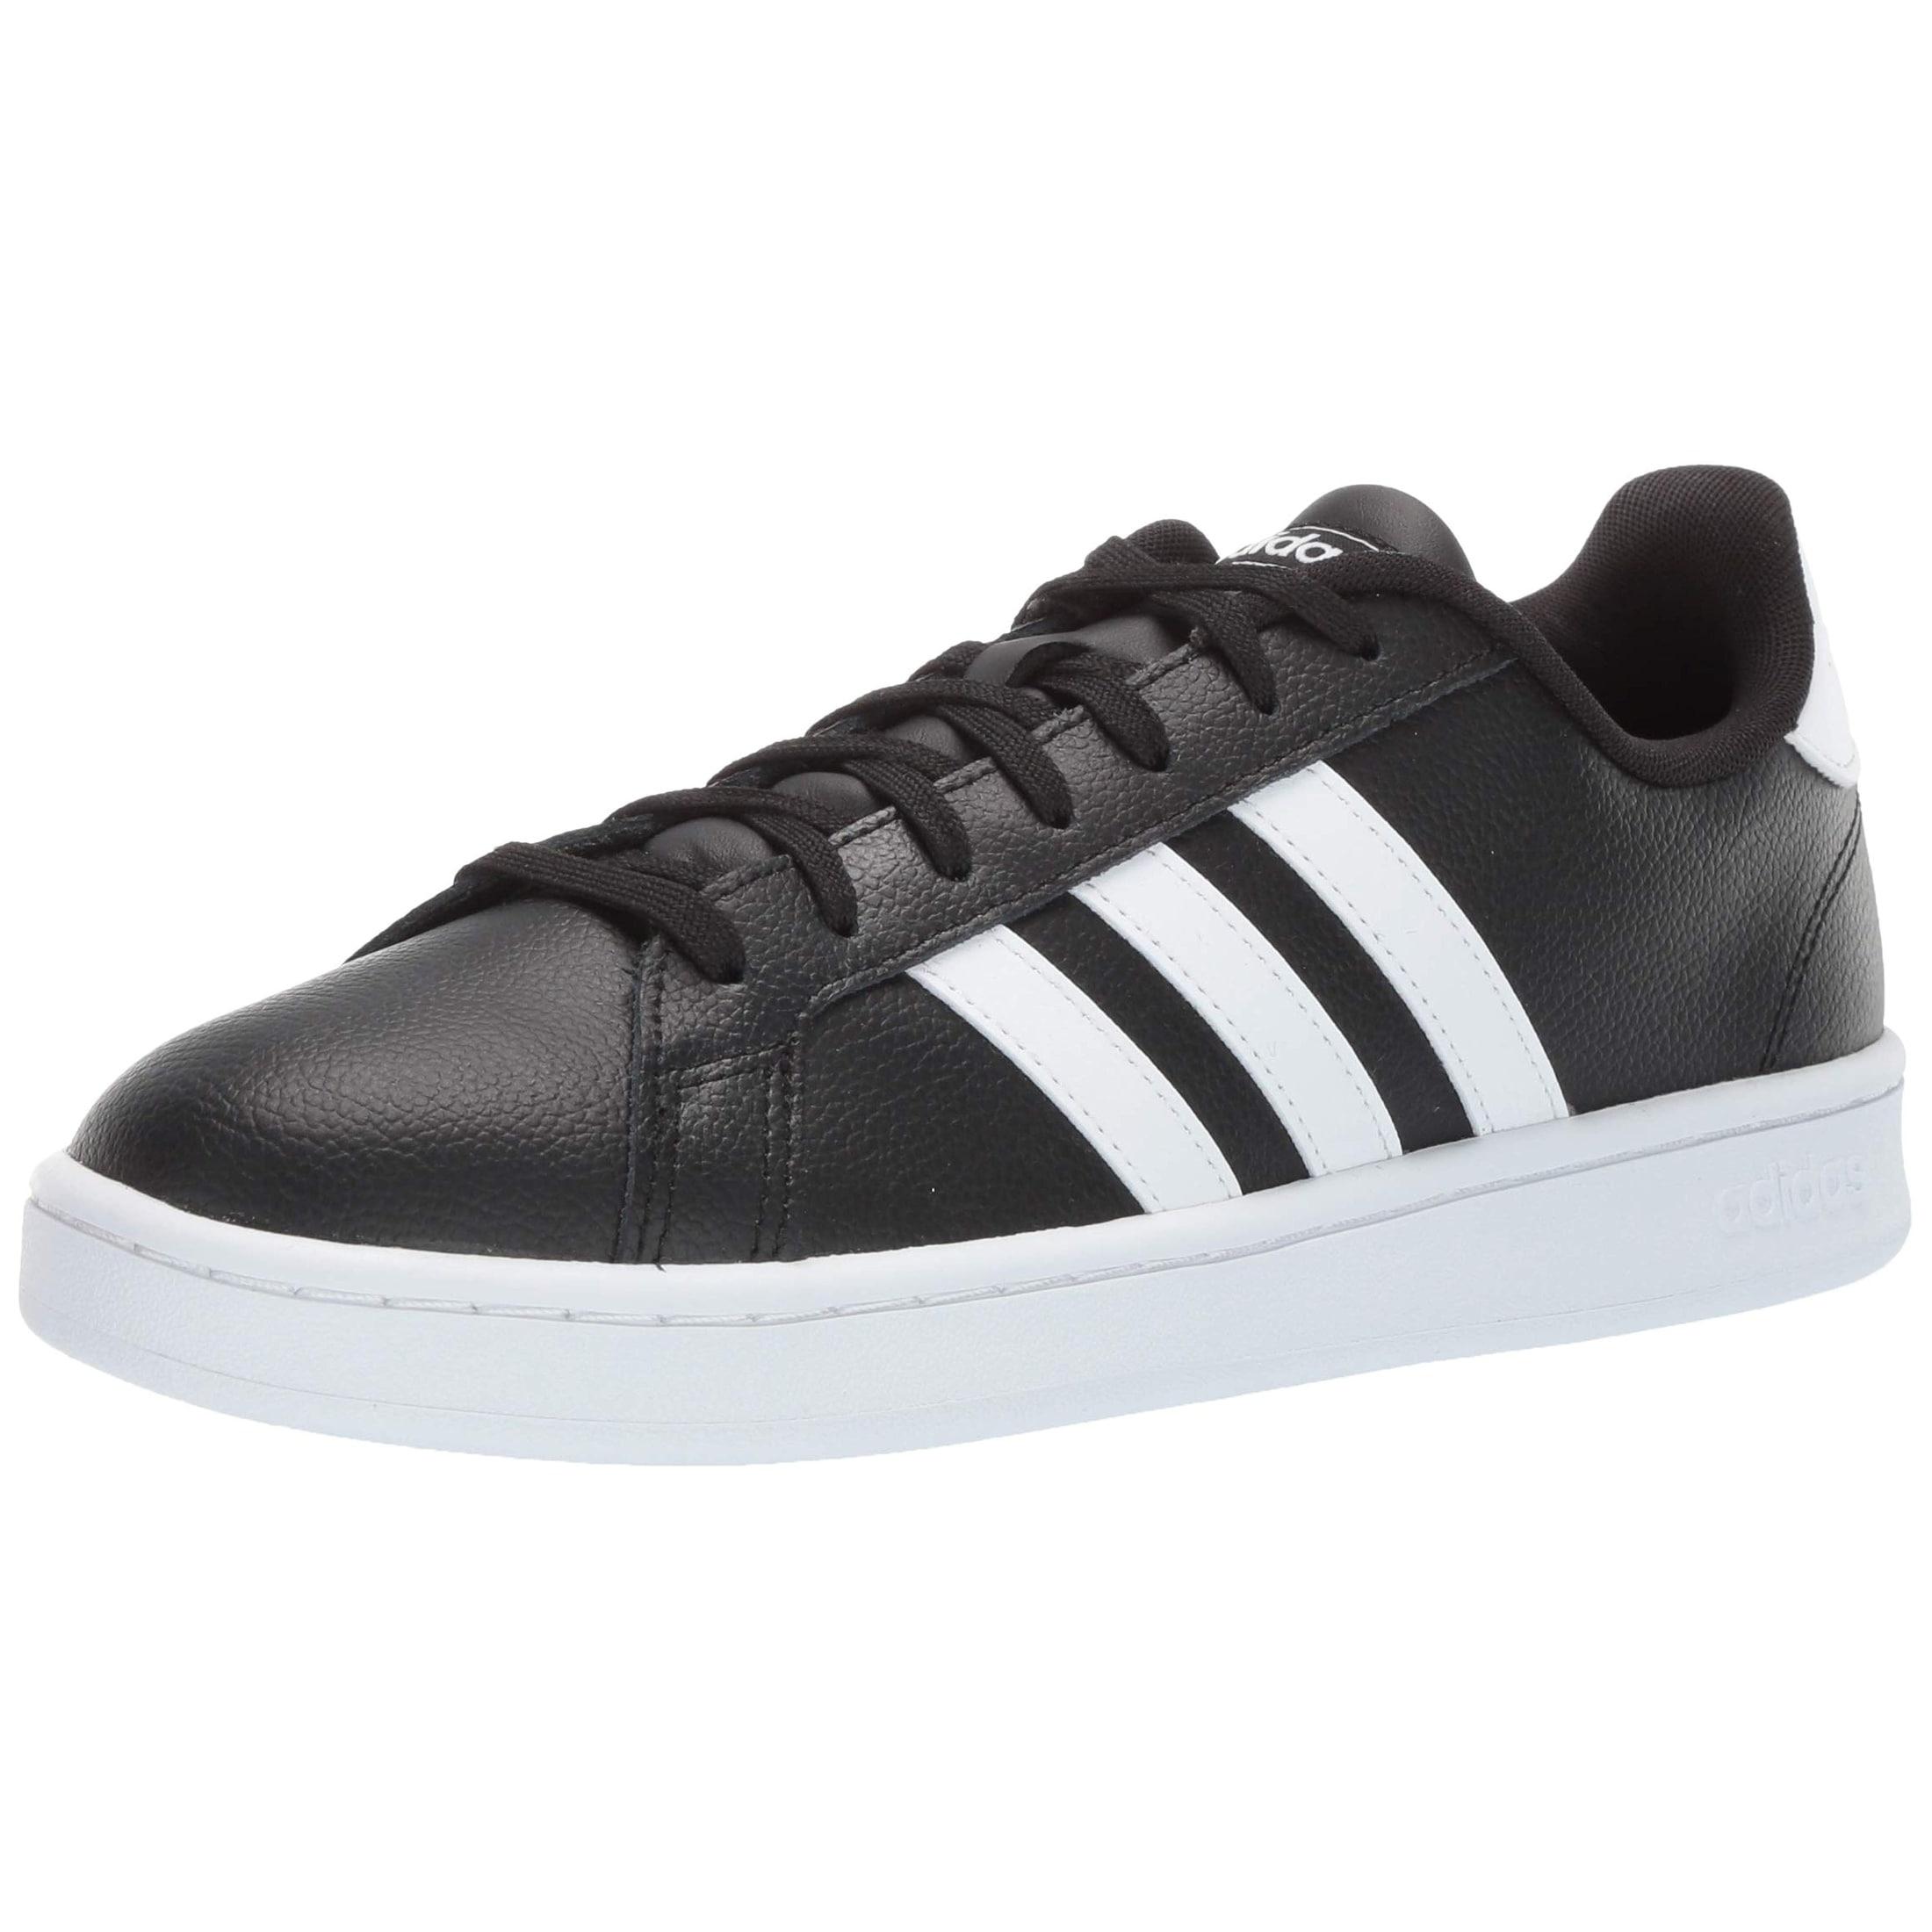 d74203850431b Shop Adidas Men s Grand Court